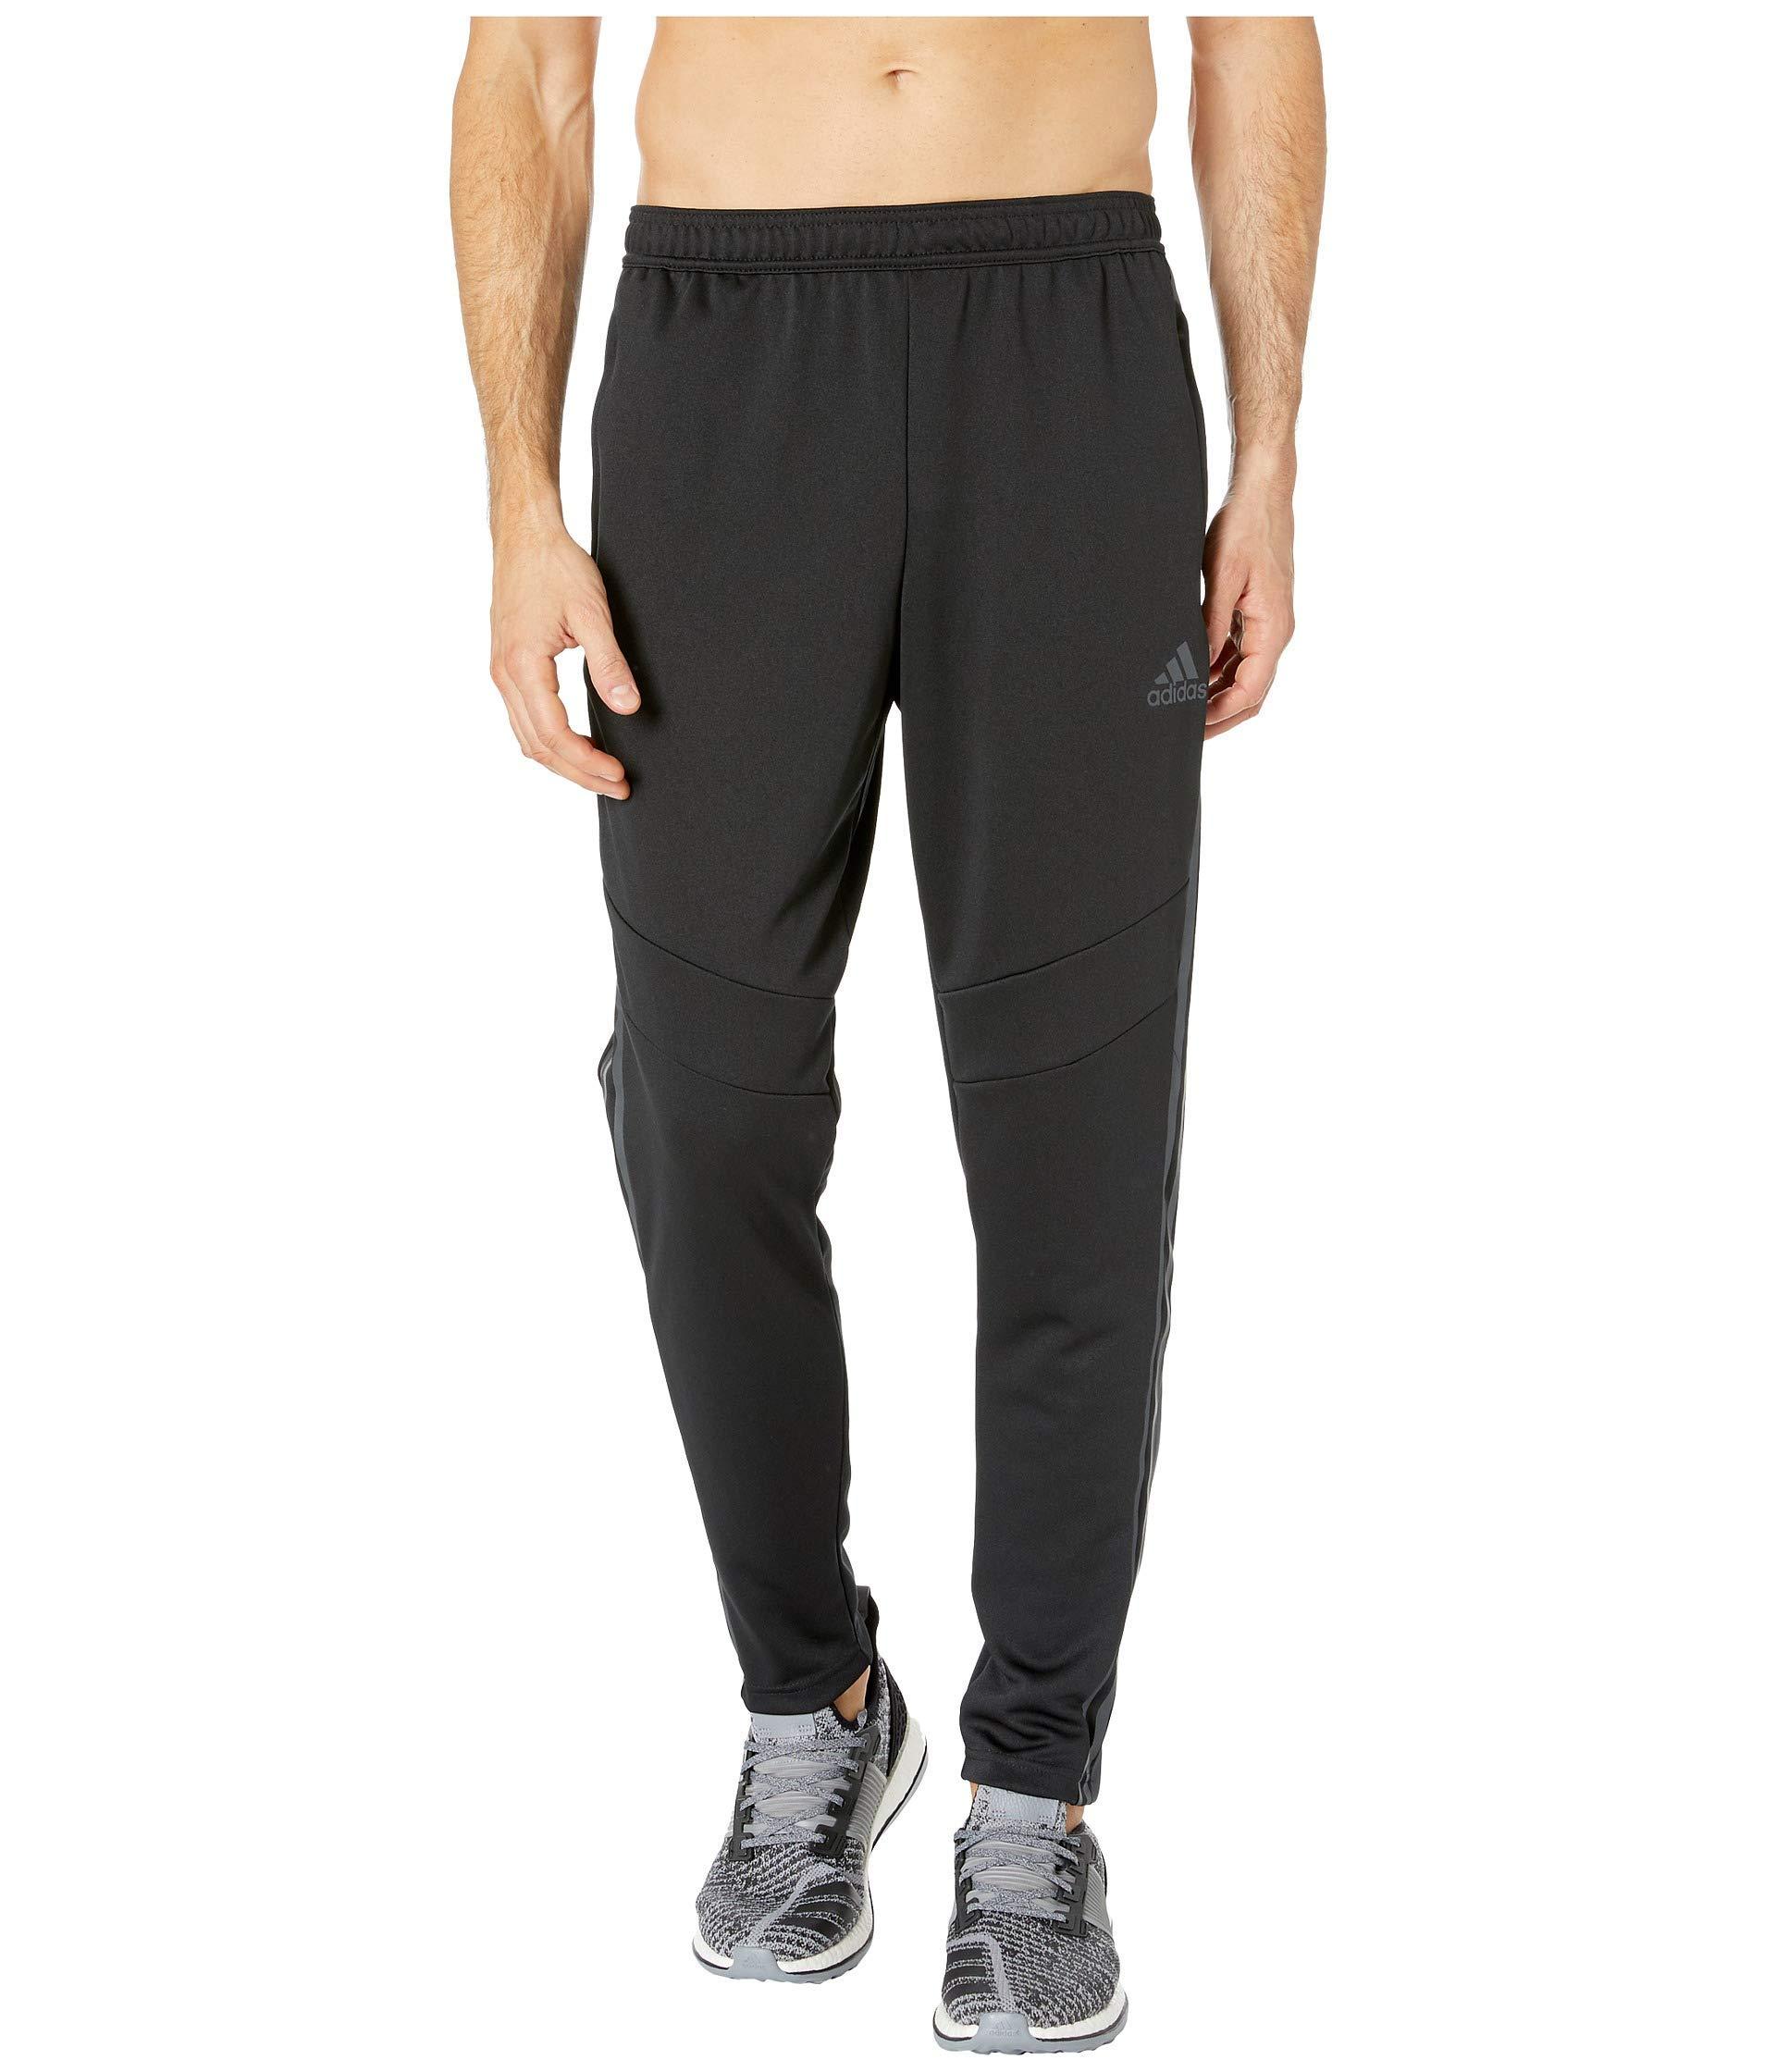 adidas Men's Soccer Tiro 19 Training Pant, Black/Carbon Pearl Essence, 3X-Large